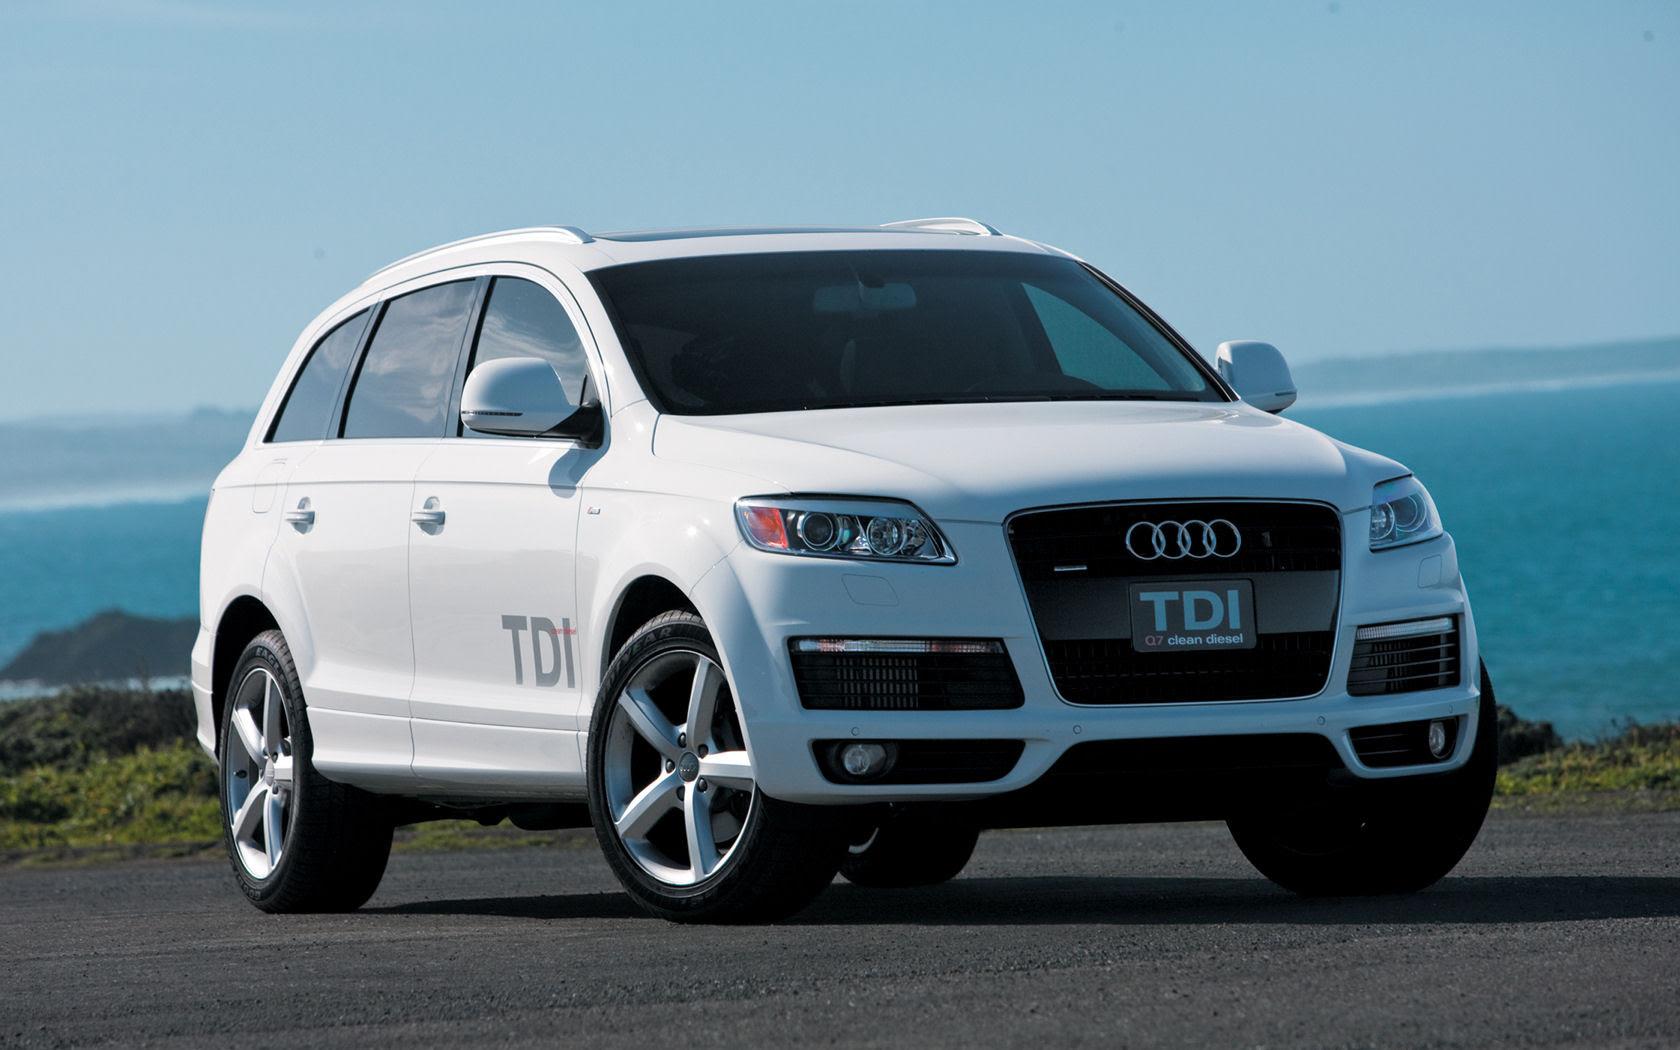 Amazing Audi Wallpapers For Desktop Pics